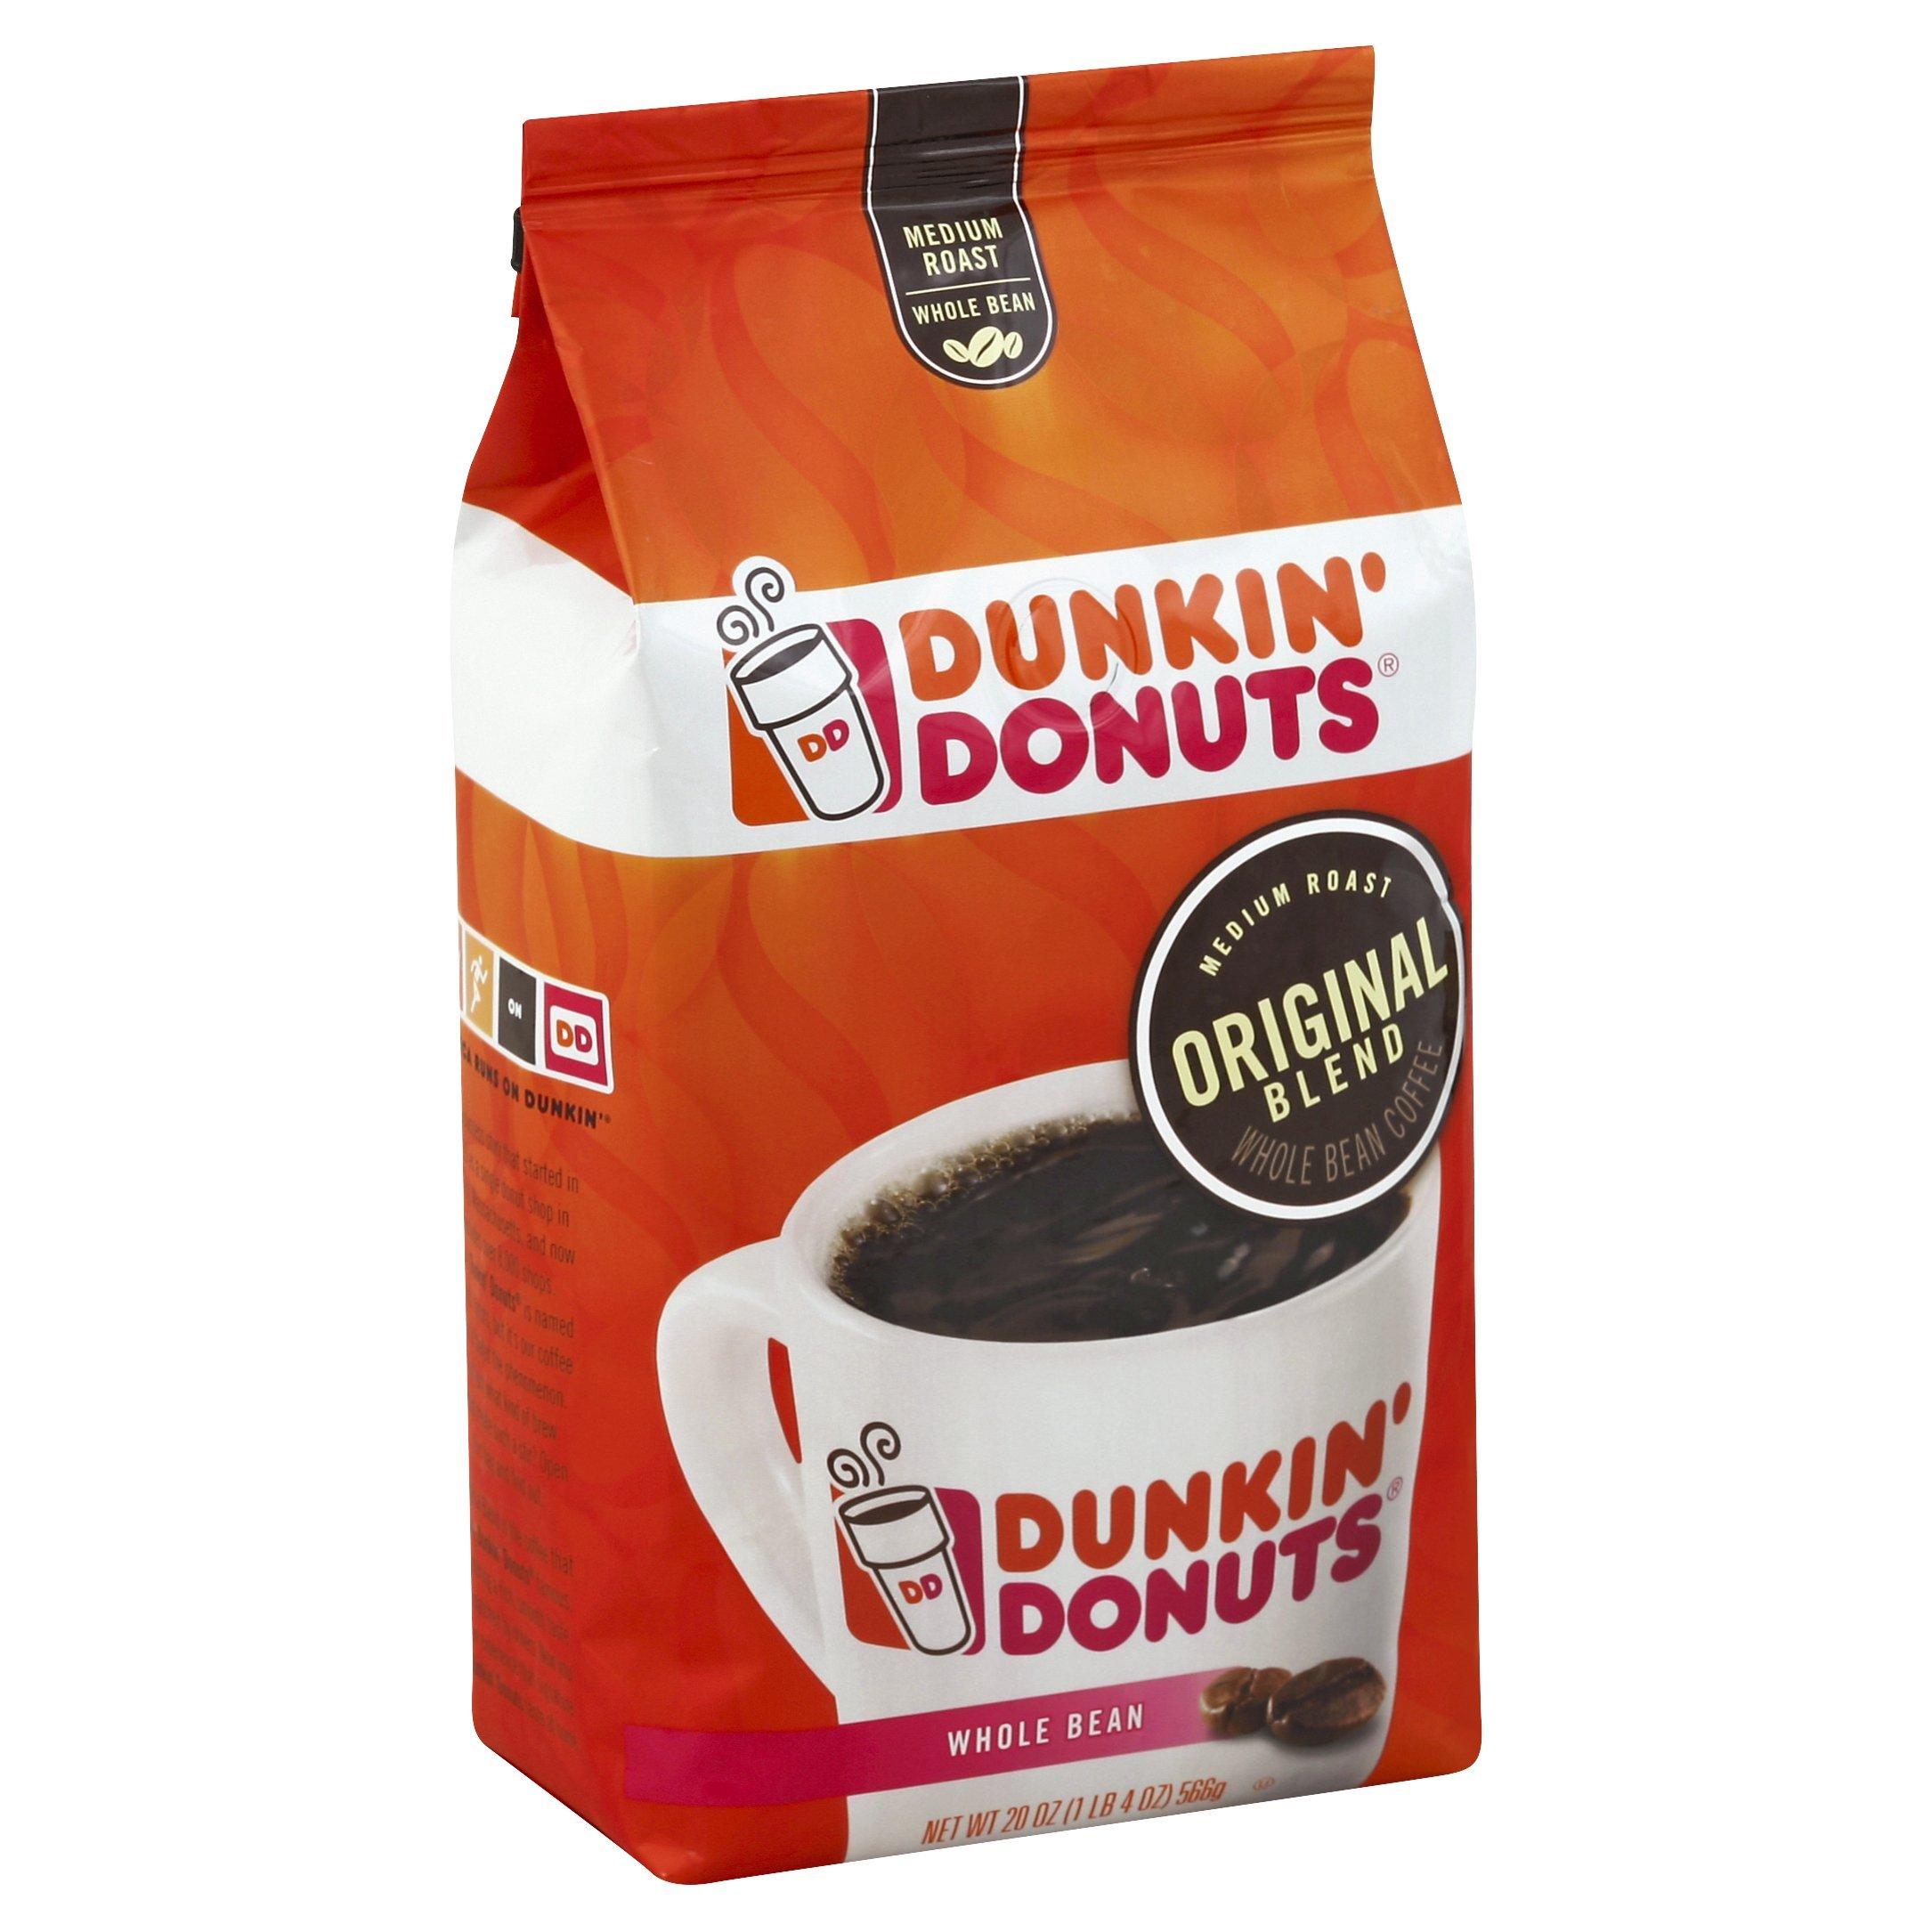 Dunkin' Donuts Original Blend Whole Bean Coffee, Medium Roast, 20 Ounces (Pack of 6)